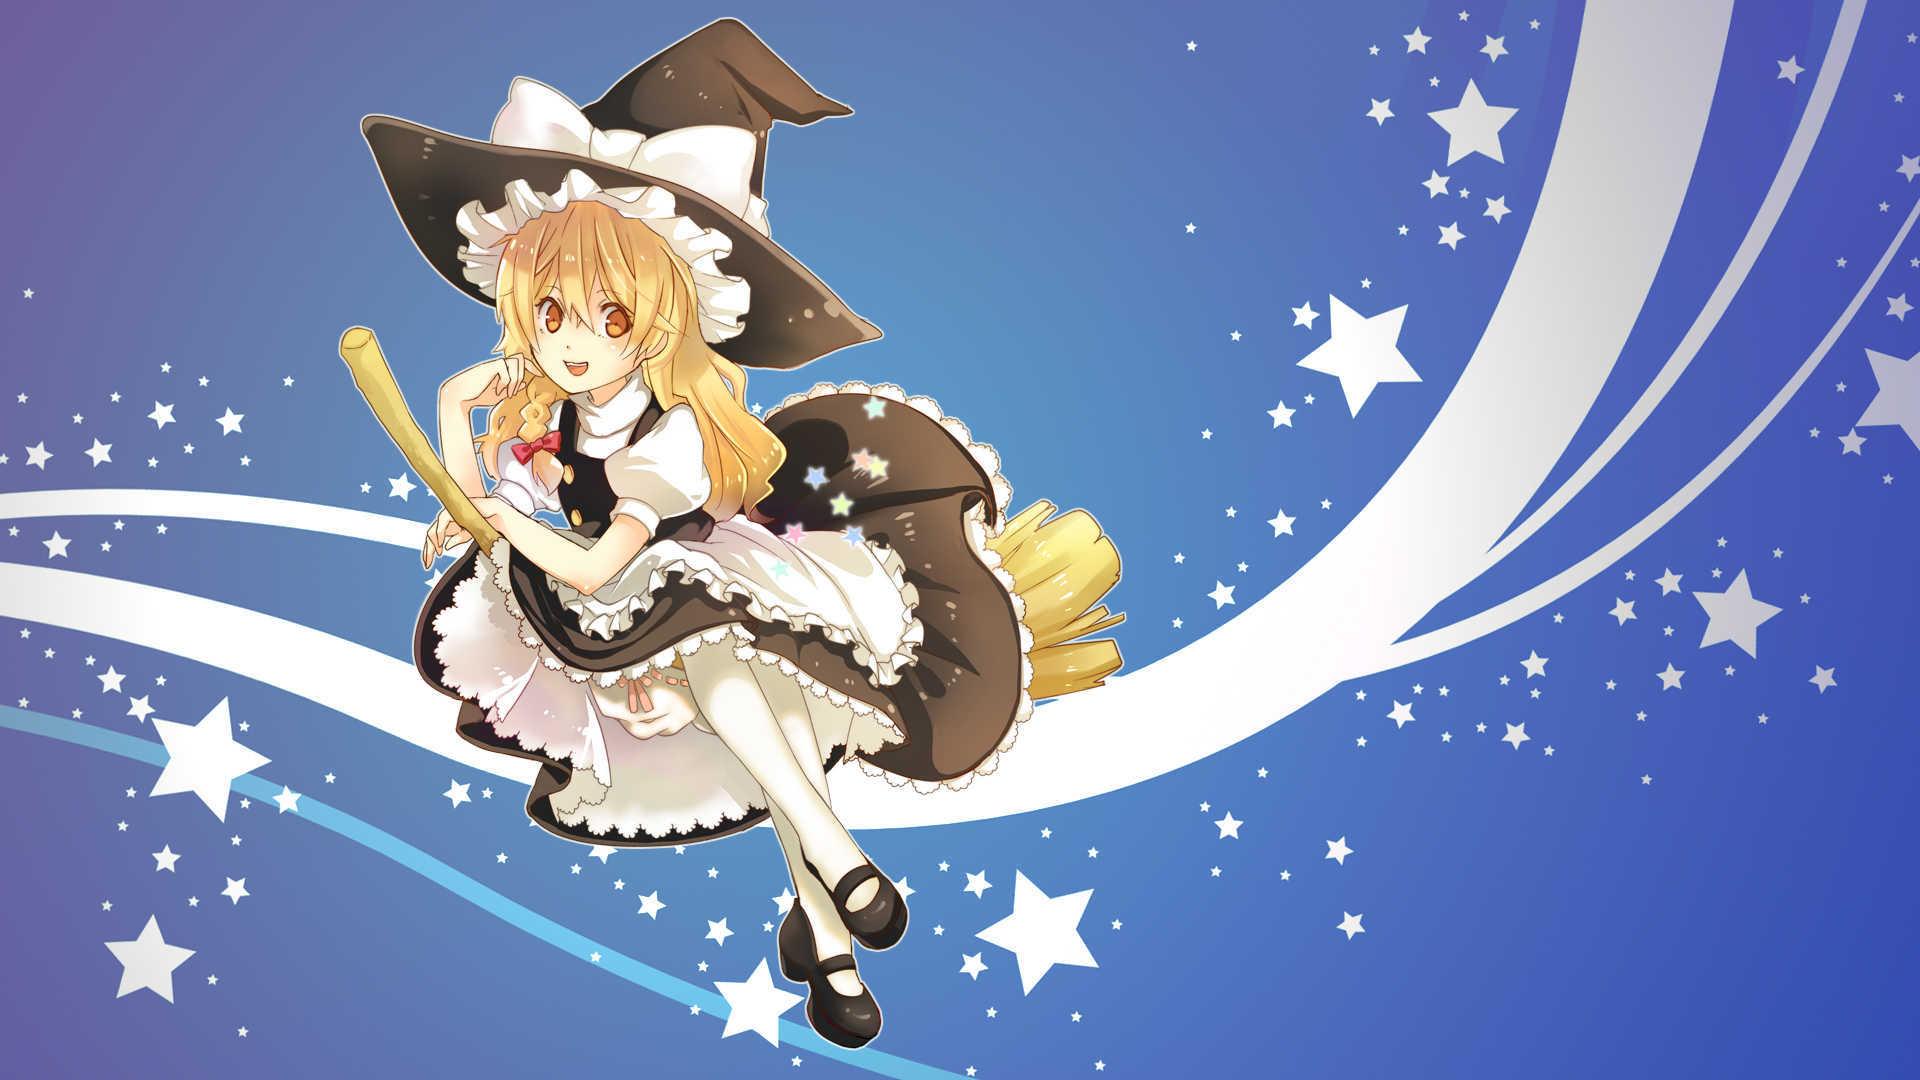 Touhou Hakurei Reimu Hd 4k Wallpaper Image Anime